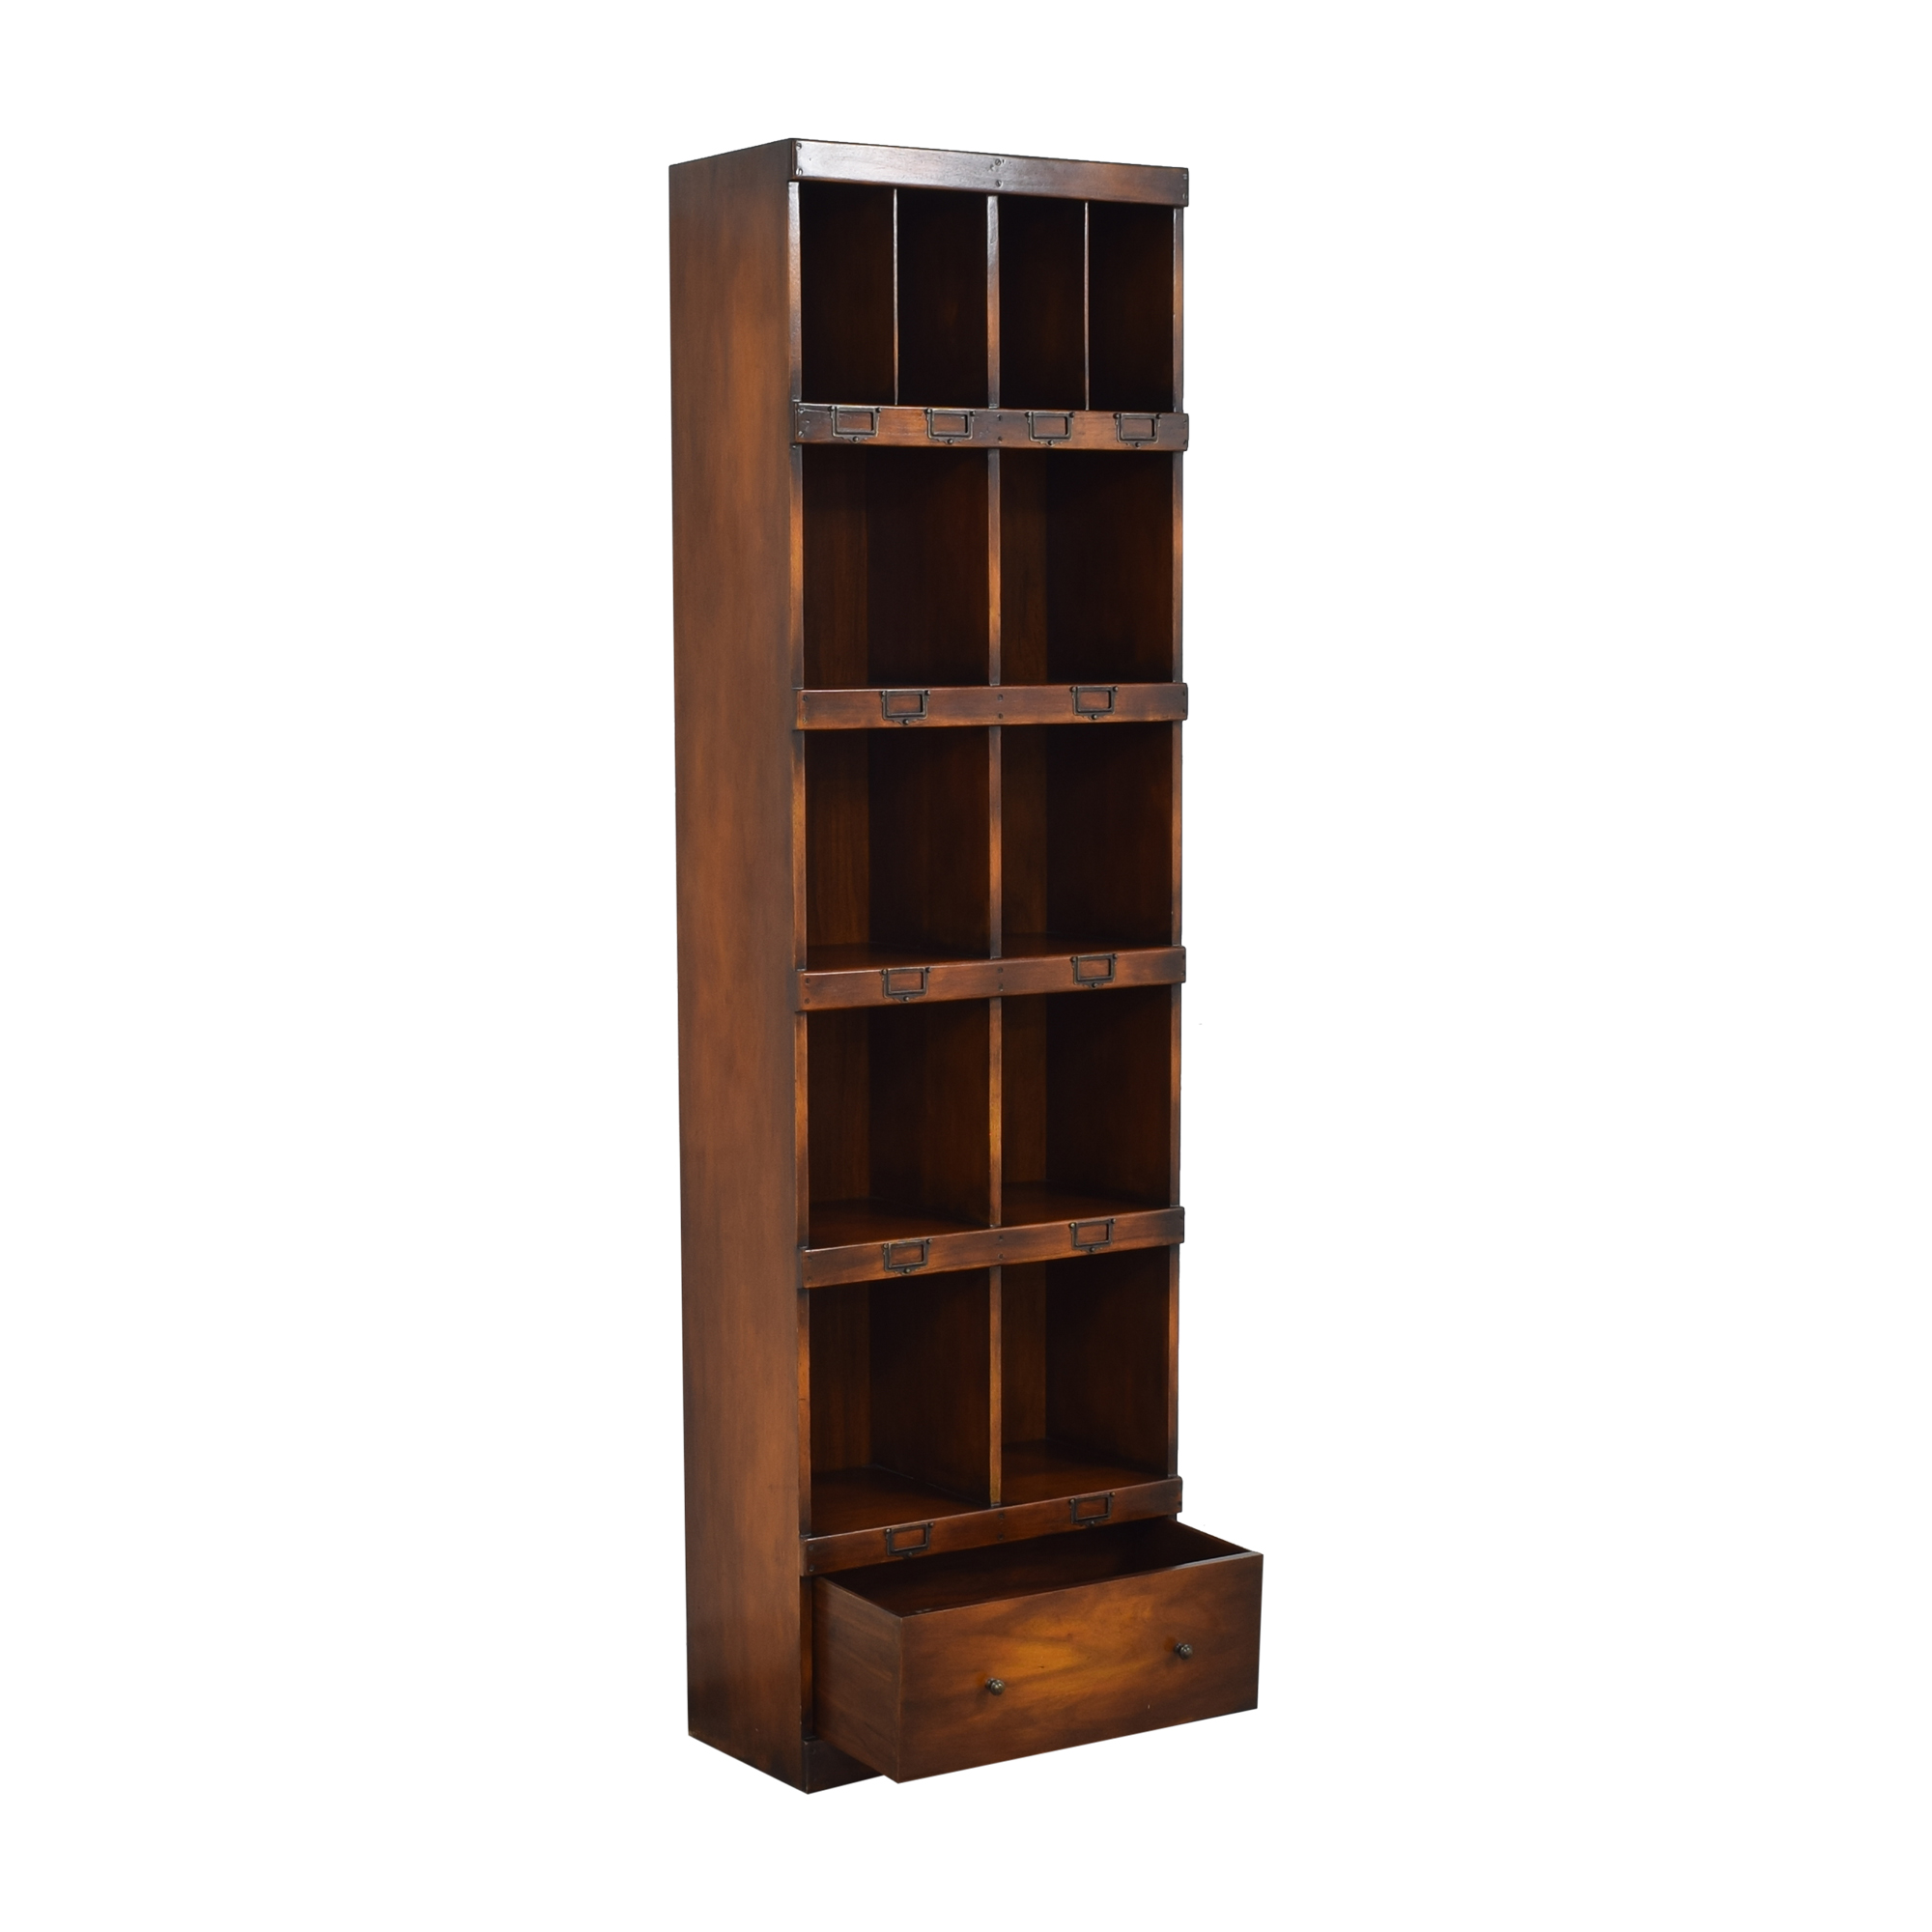 Theodore Alexander Theodore Alexander Agra Bookcase used